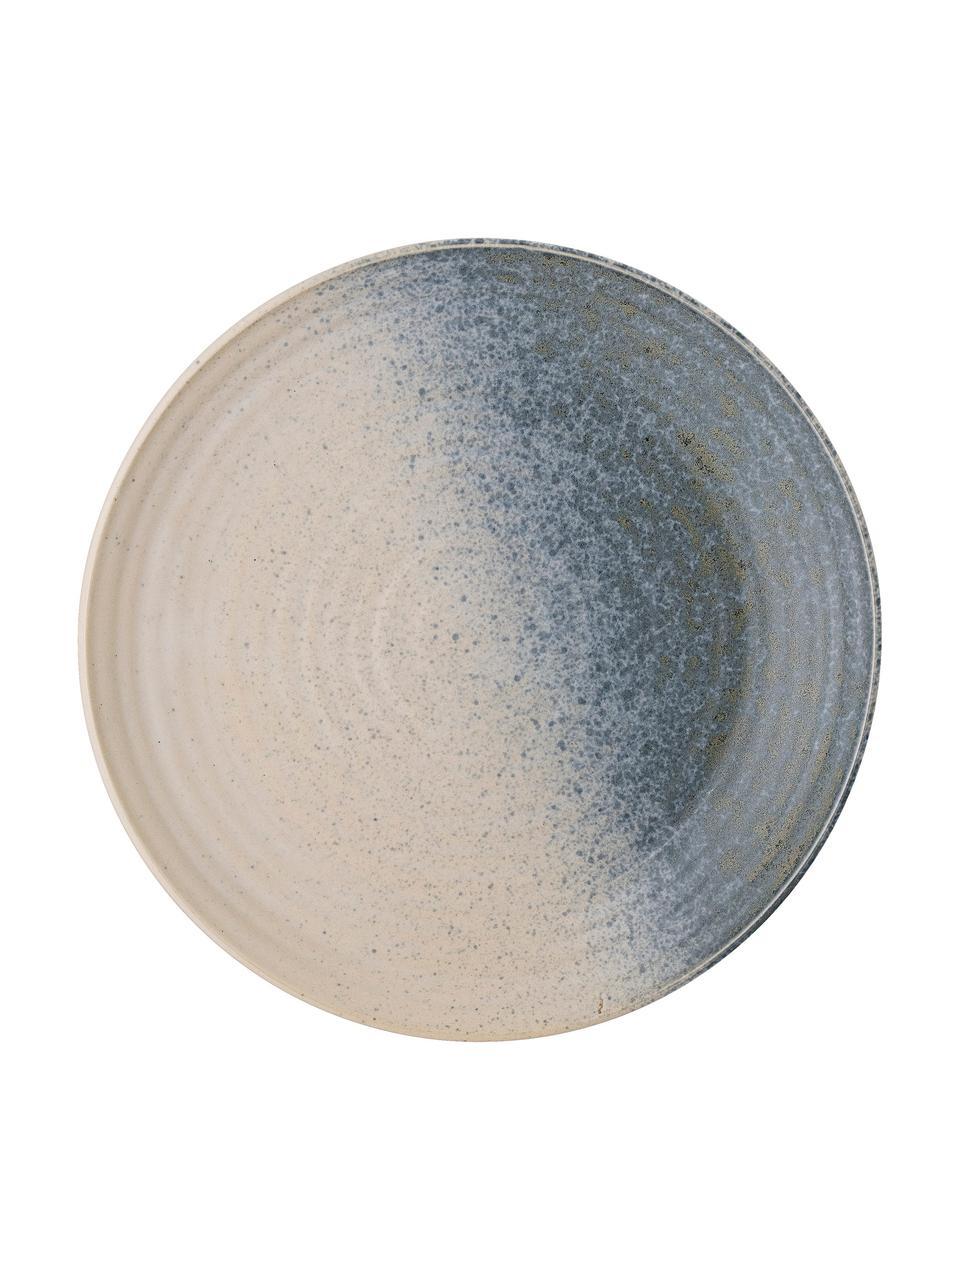 Piatto da dessert in gres fatto a mano Aura, Gres, Blu, beige, verde, Ø 21 cm